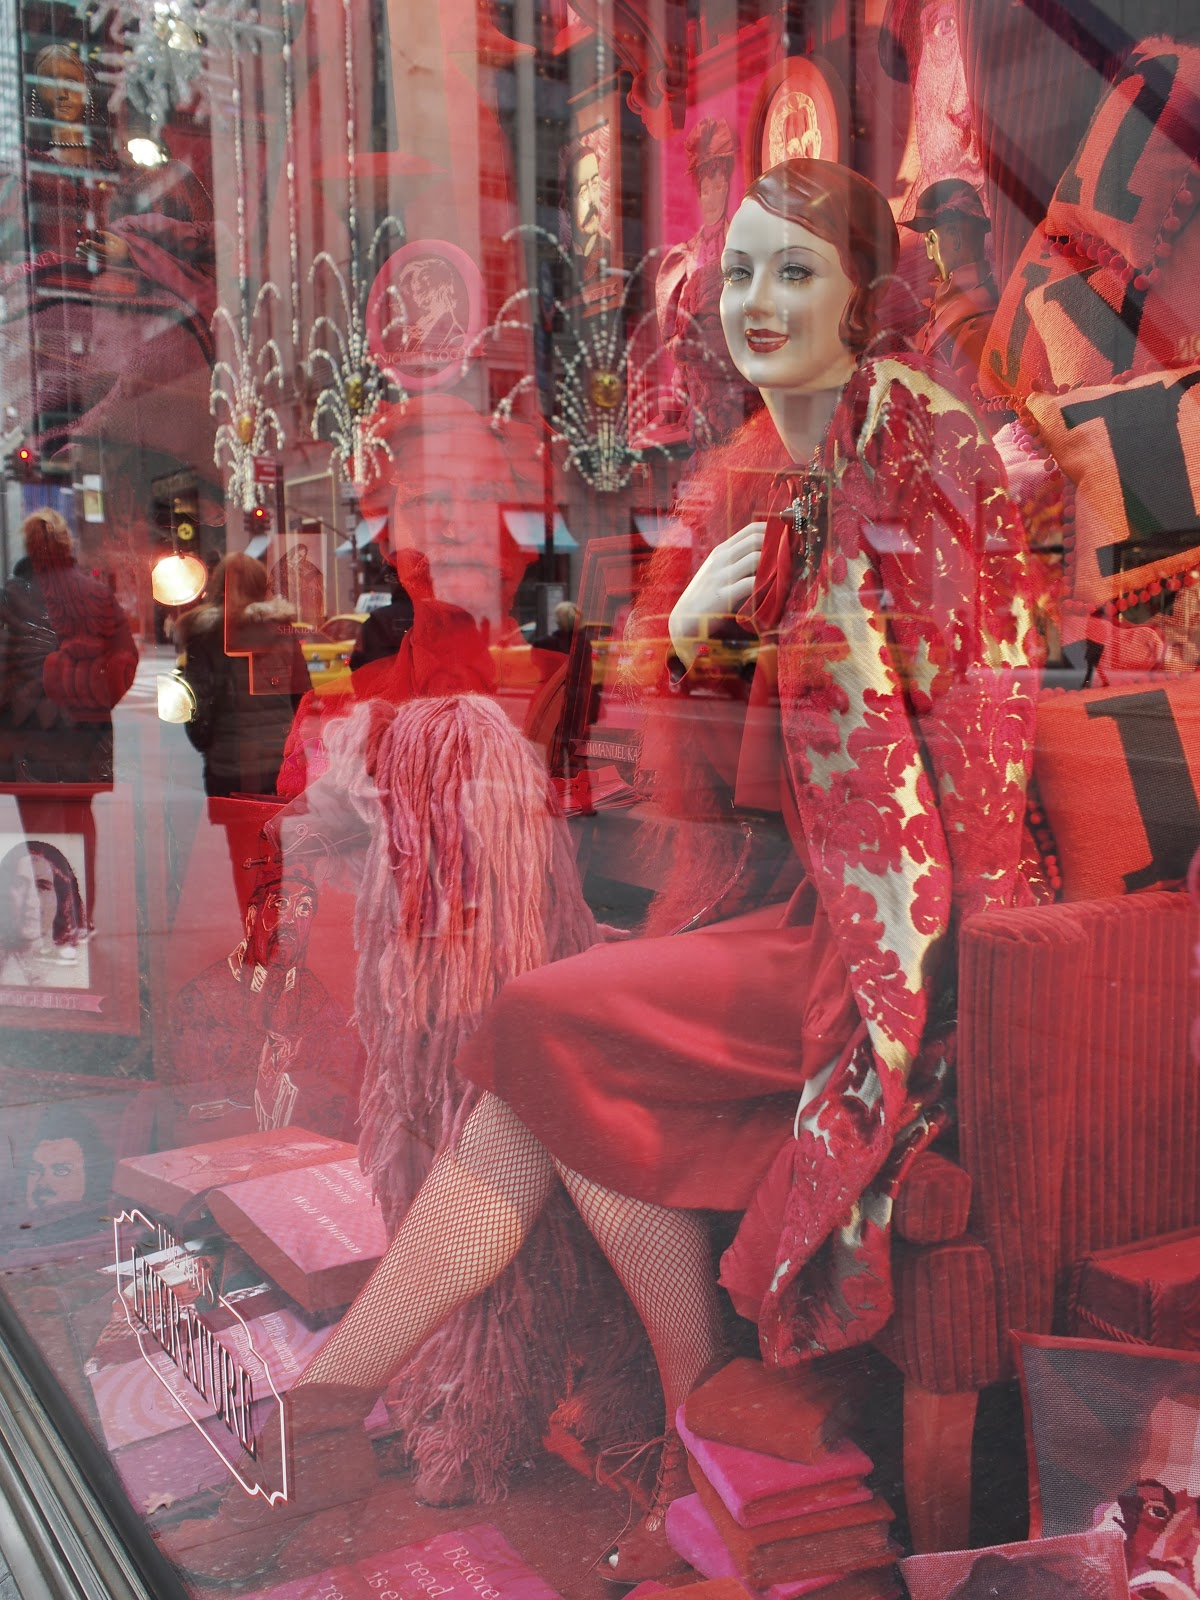 Fishnets #Fishnets #bgwindows # #holidaywindows #5thavenuewindows #NYC  #holidays #besttimeoftheyear #nyc ©2014 Nancy Lundebjerg